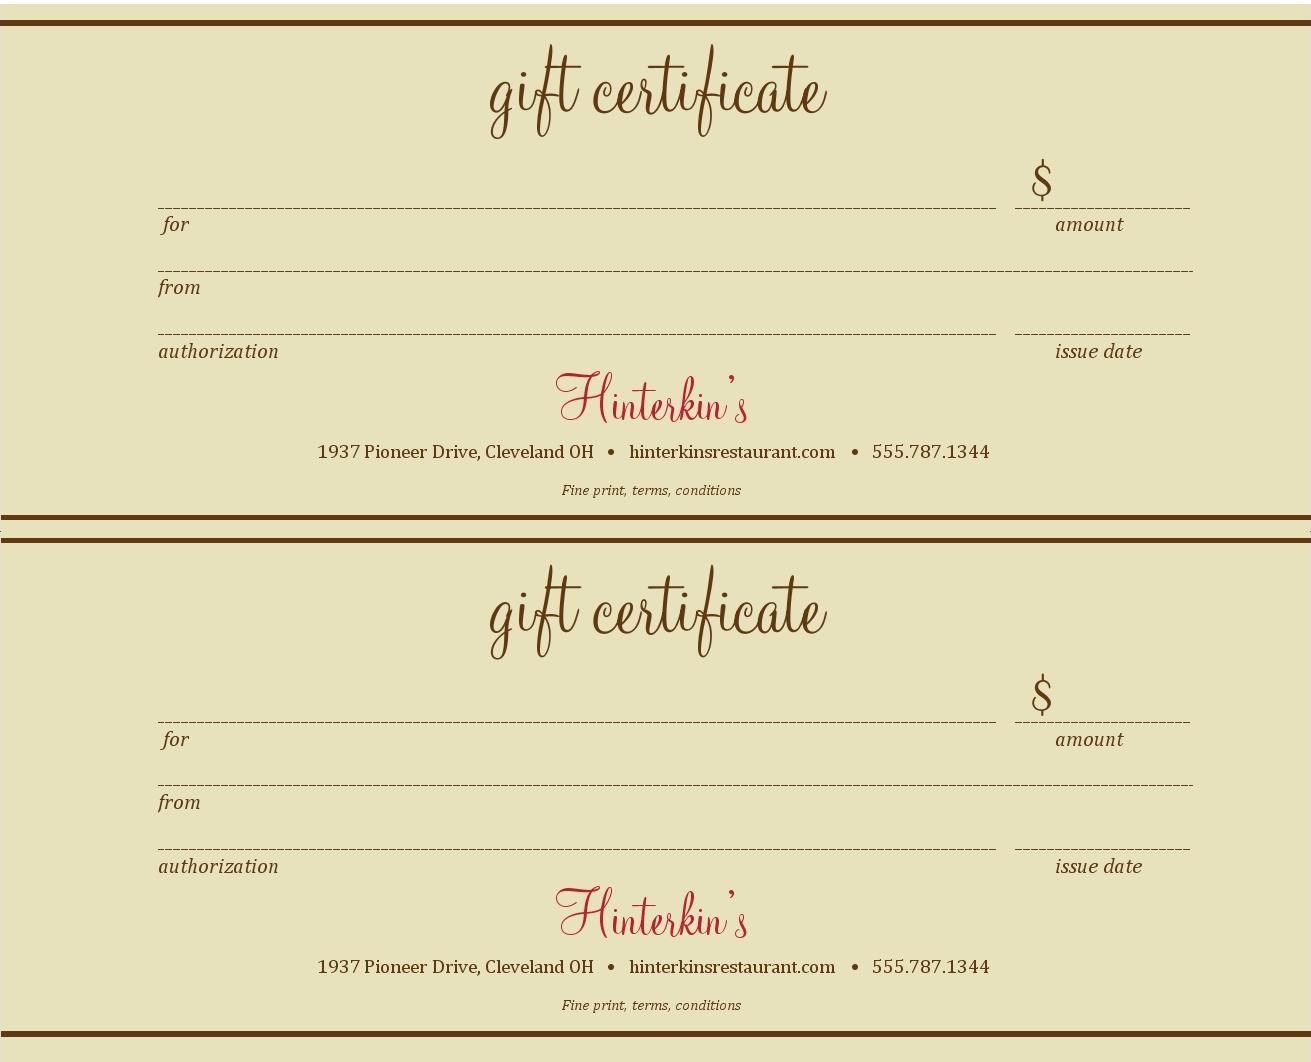 023 Restaurant Gift Certificate Template 121364 Printable - Free Printable Gift Certificates For Hair Salon